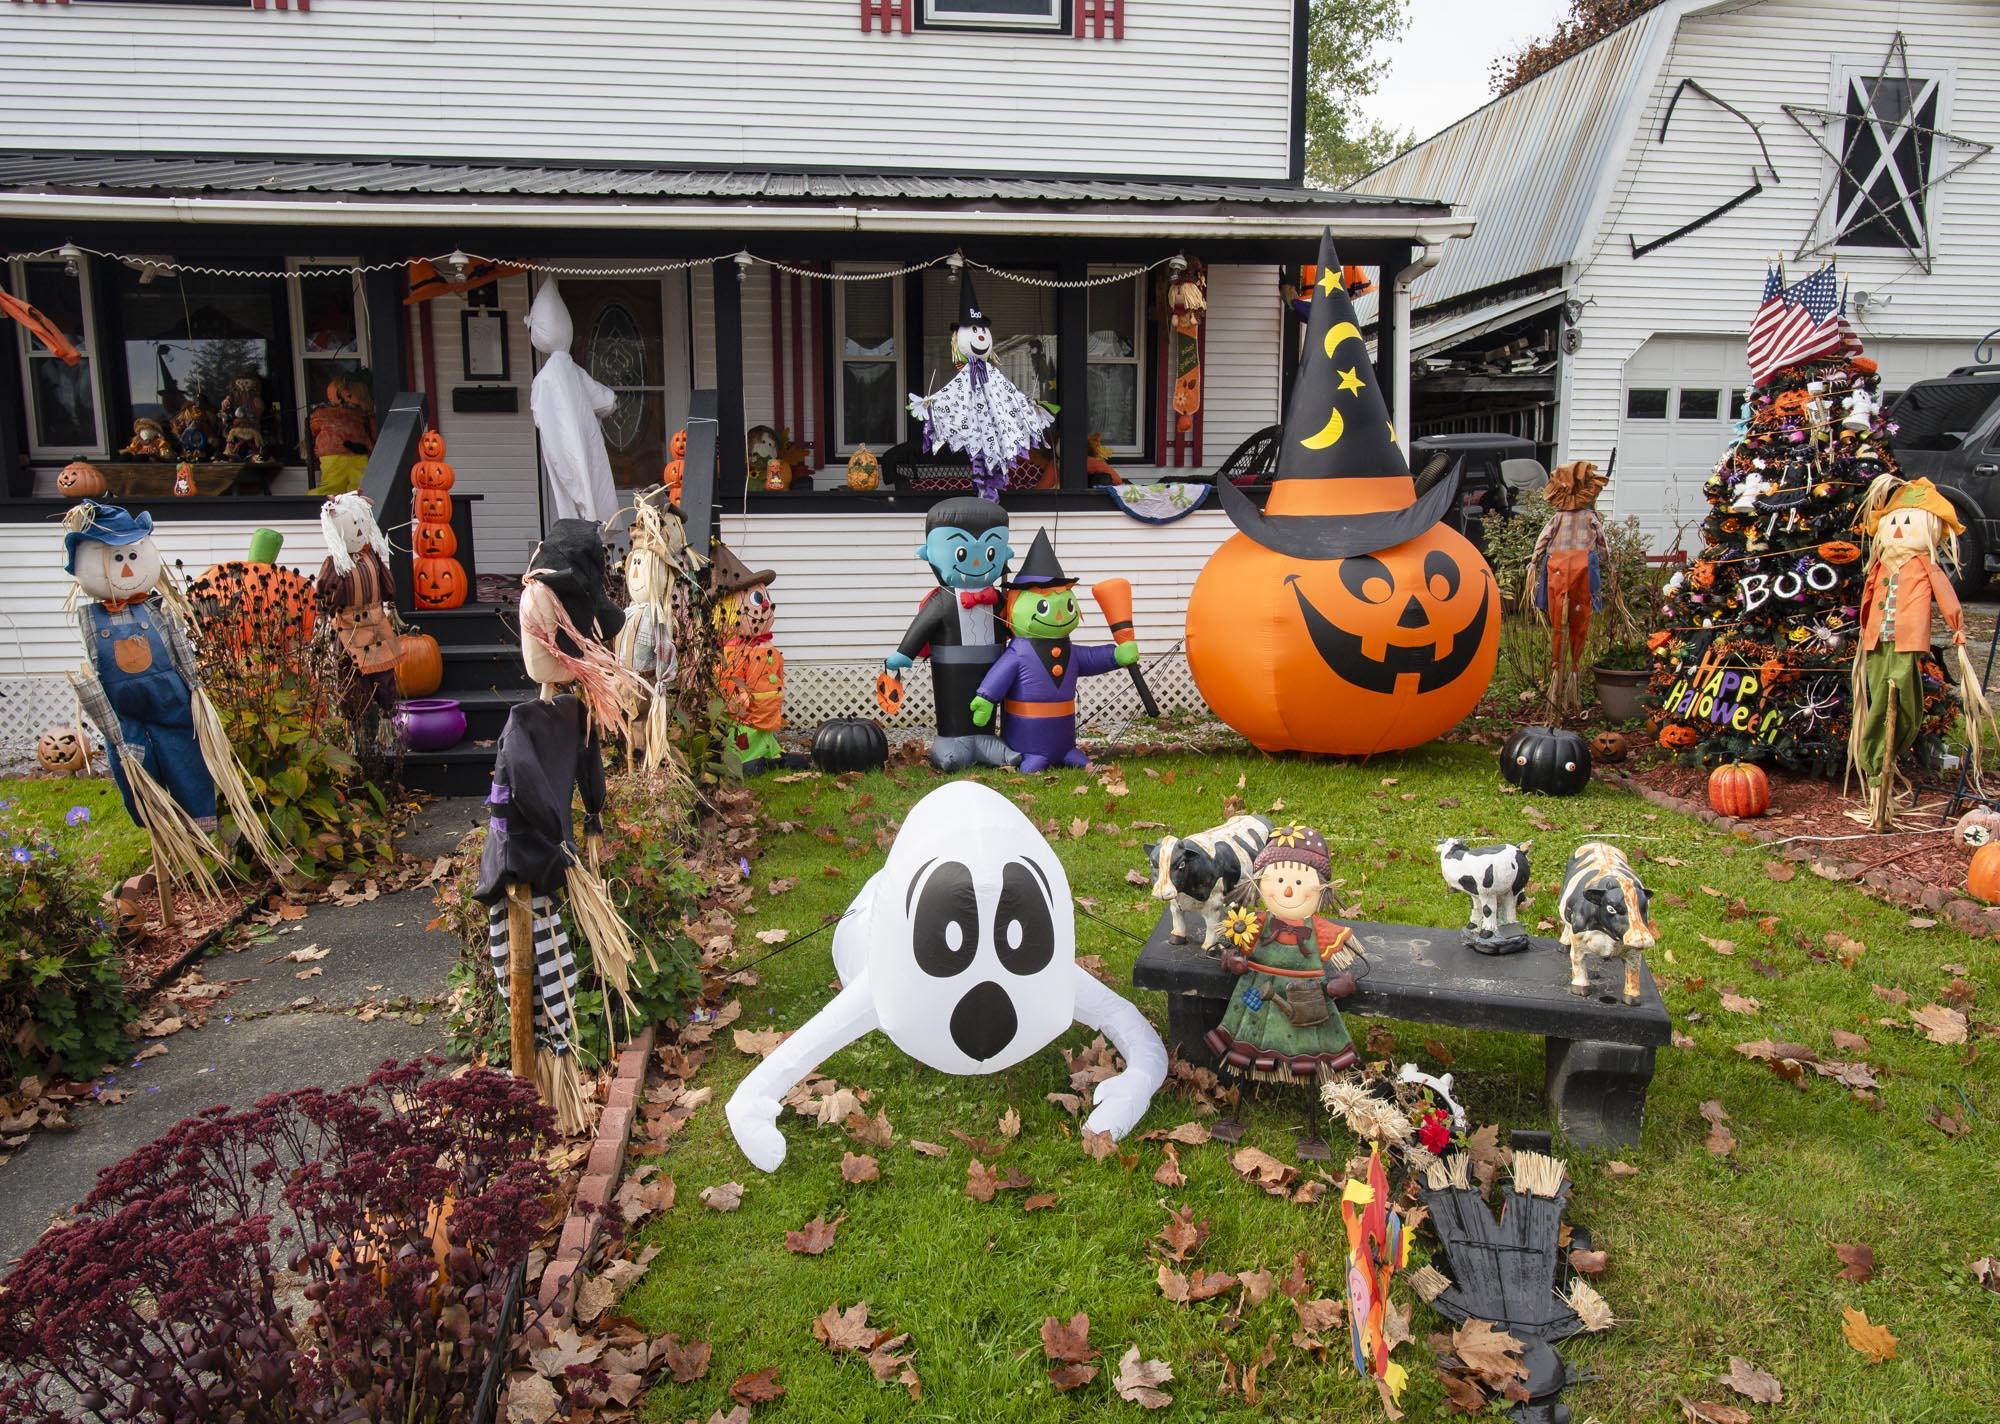 Halloween Burlington Vt 2020 Burlington schools cancel Halloween parade – and join culture war